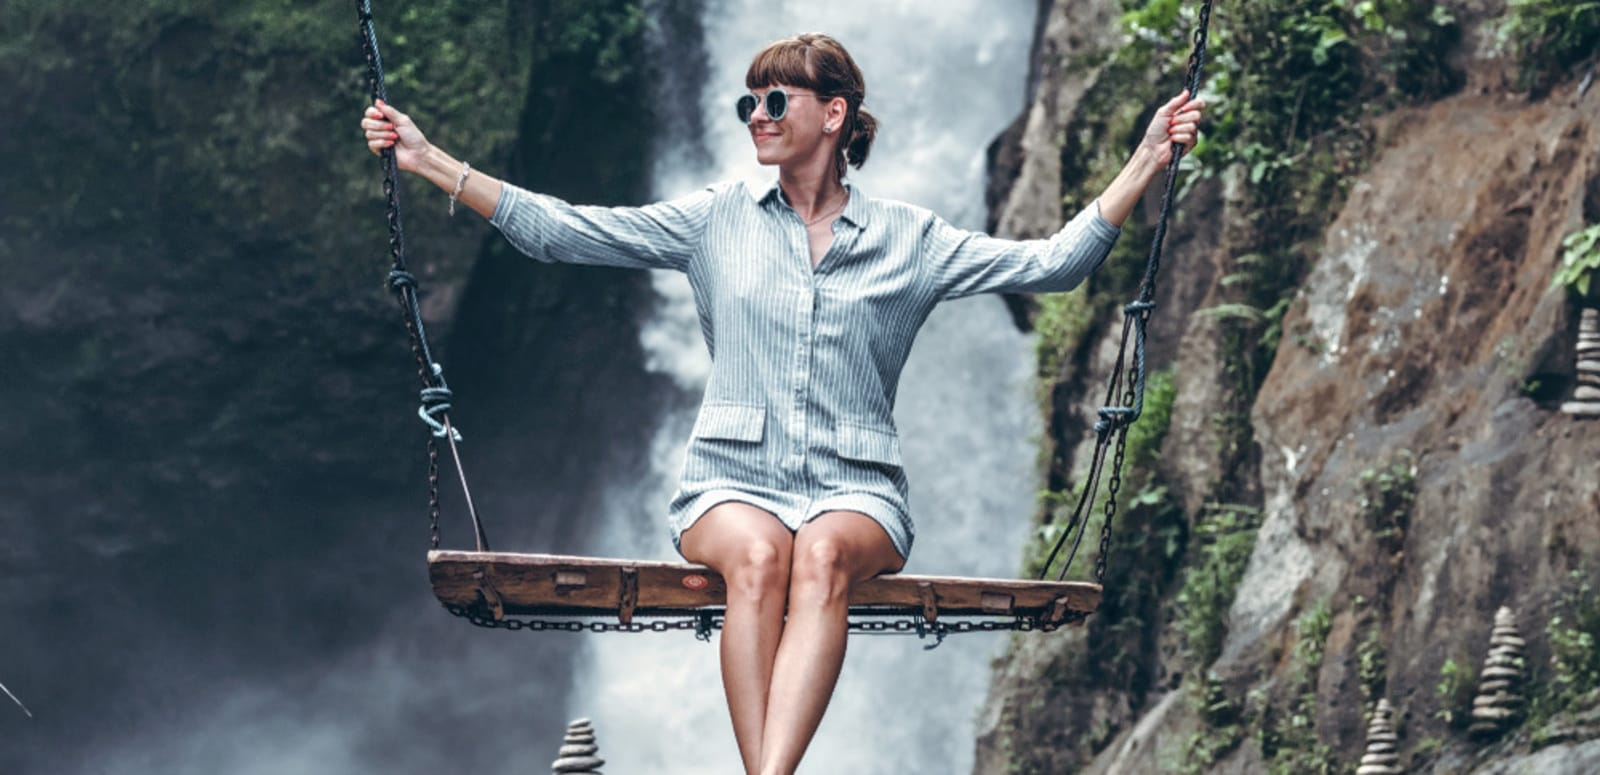 Bali Waterfall Tour With Bali Swing Flat 15 Off